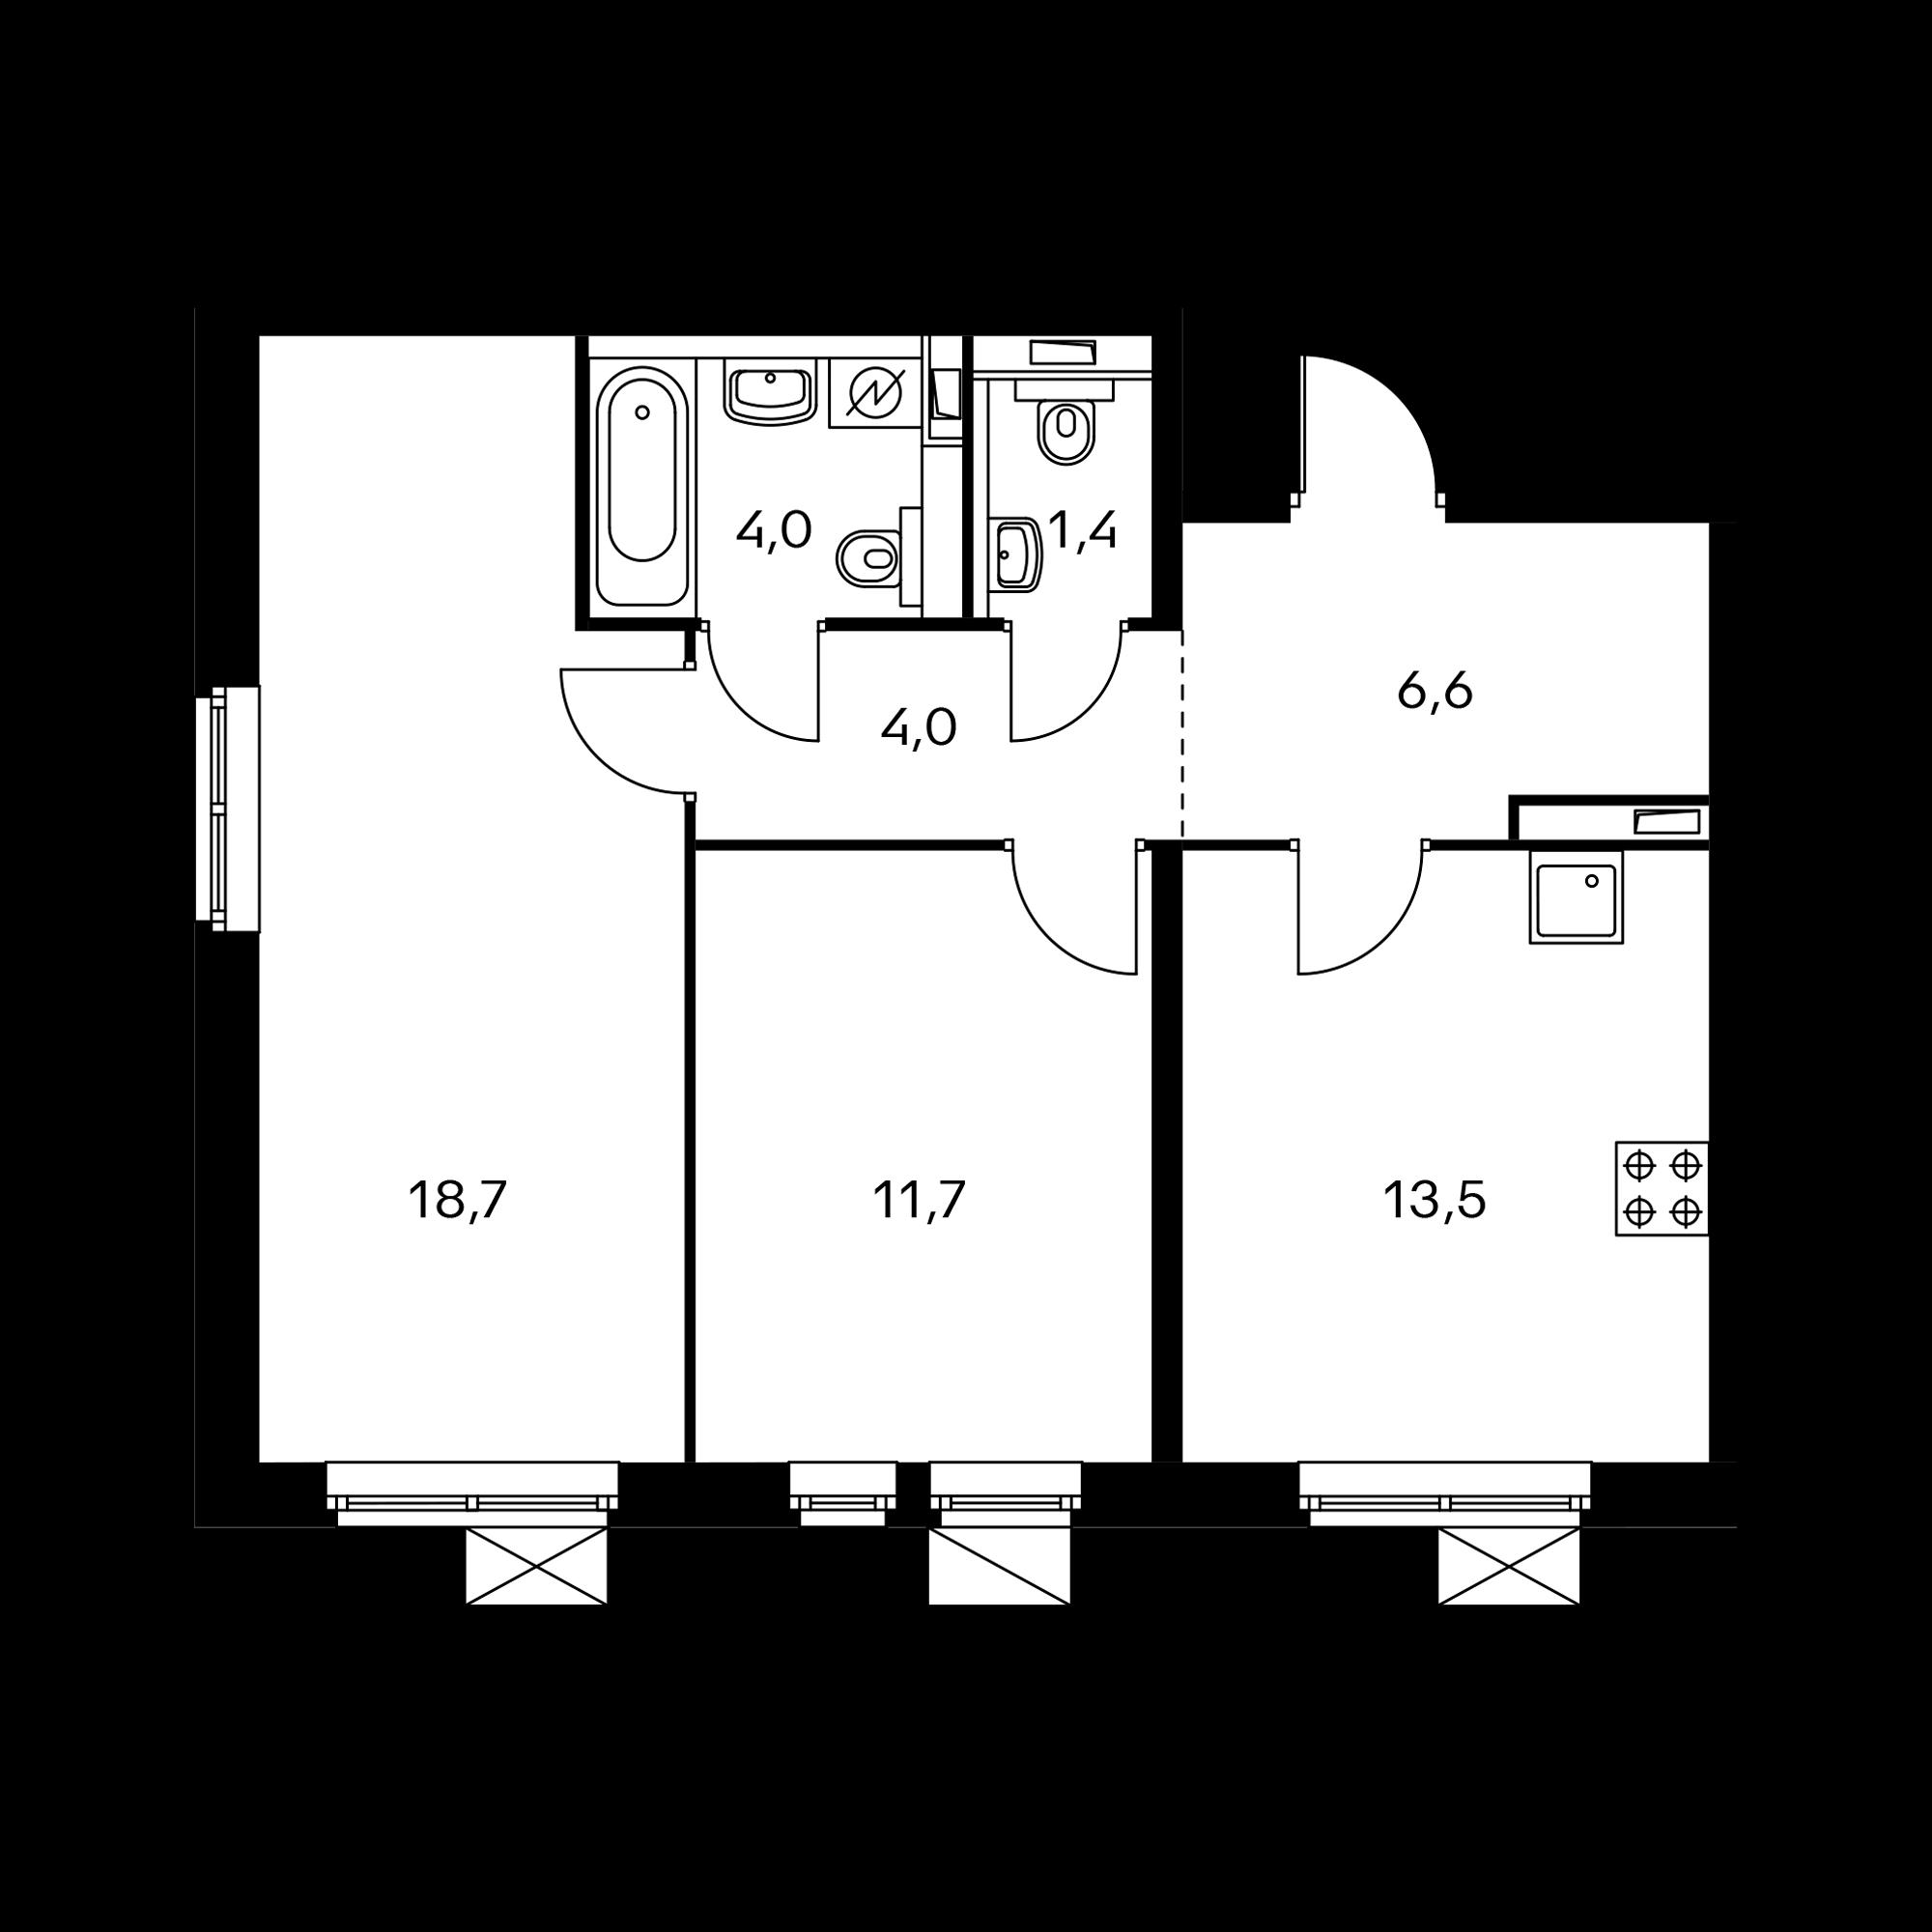 2KM4_9.6-1